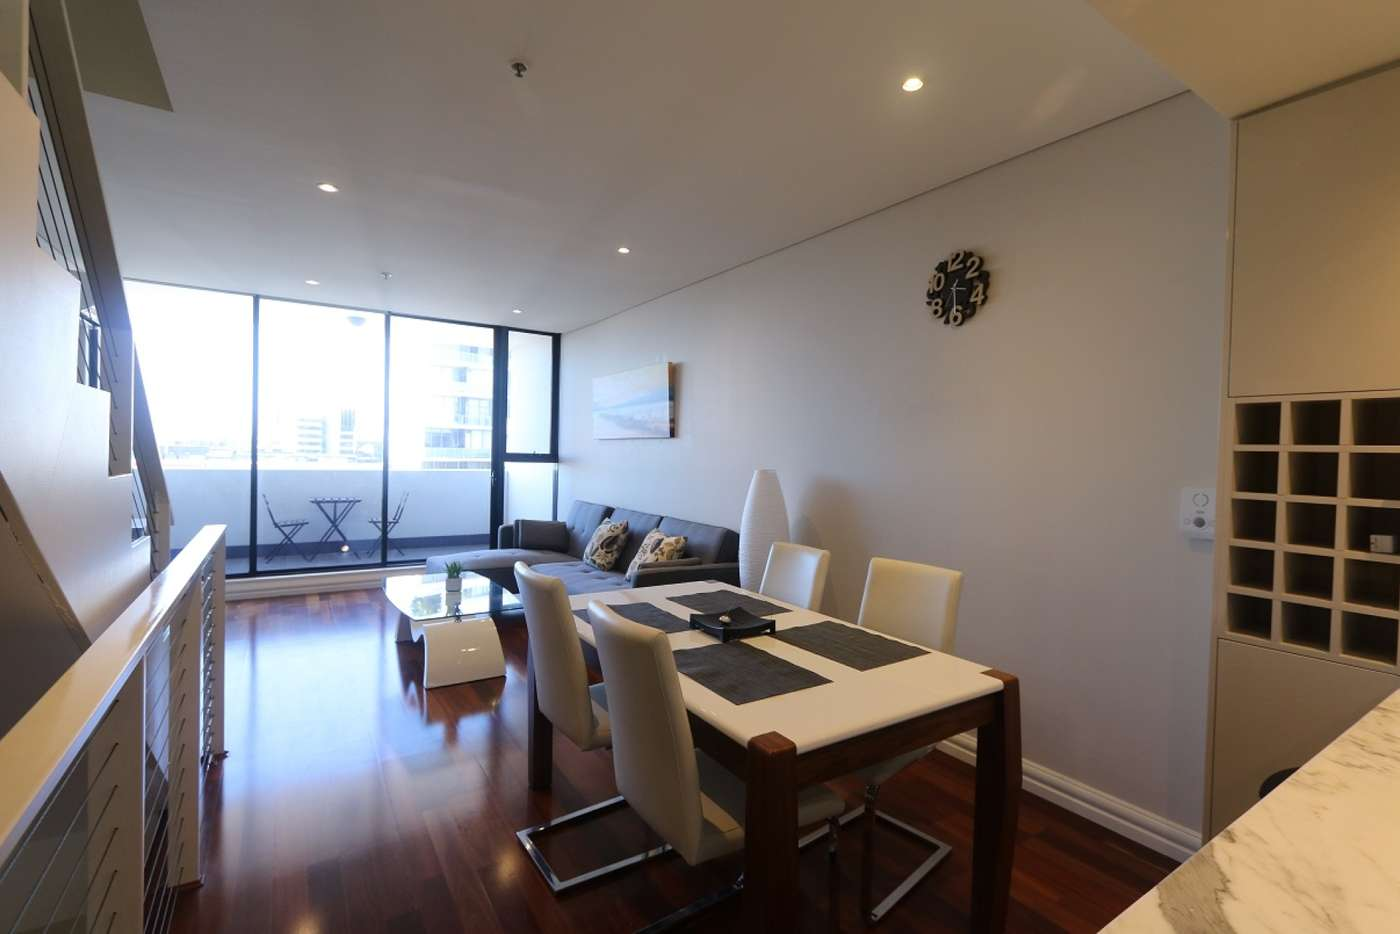 Main view of Homely apartment listing, 15 Joynton  Avenue, Zetland NSW 2017